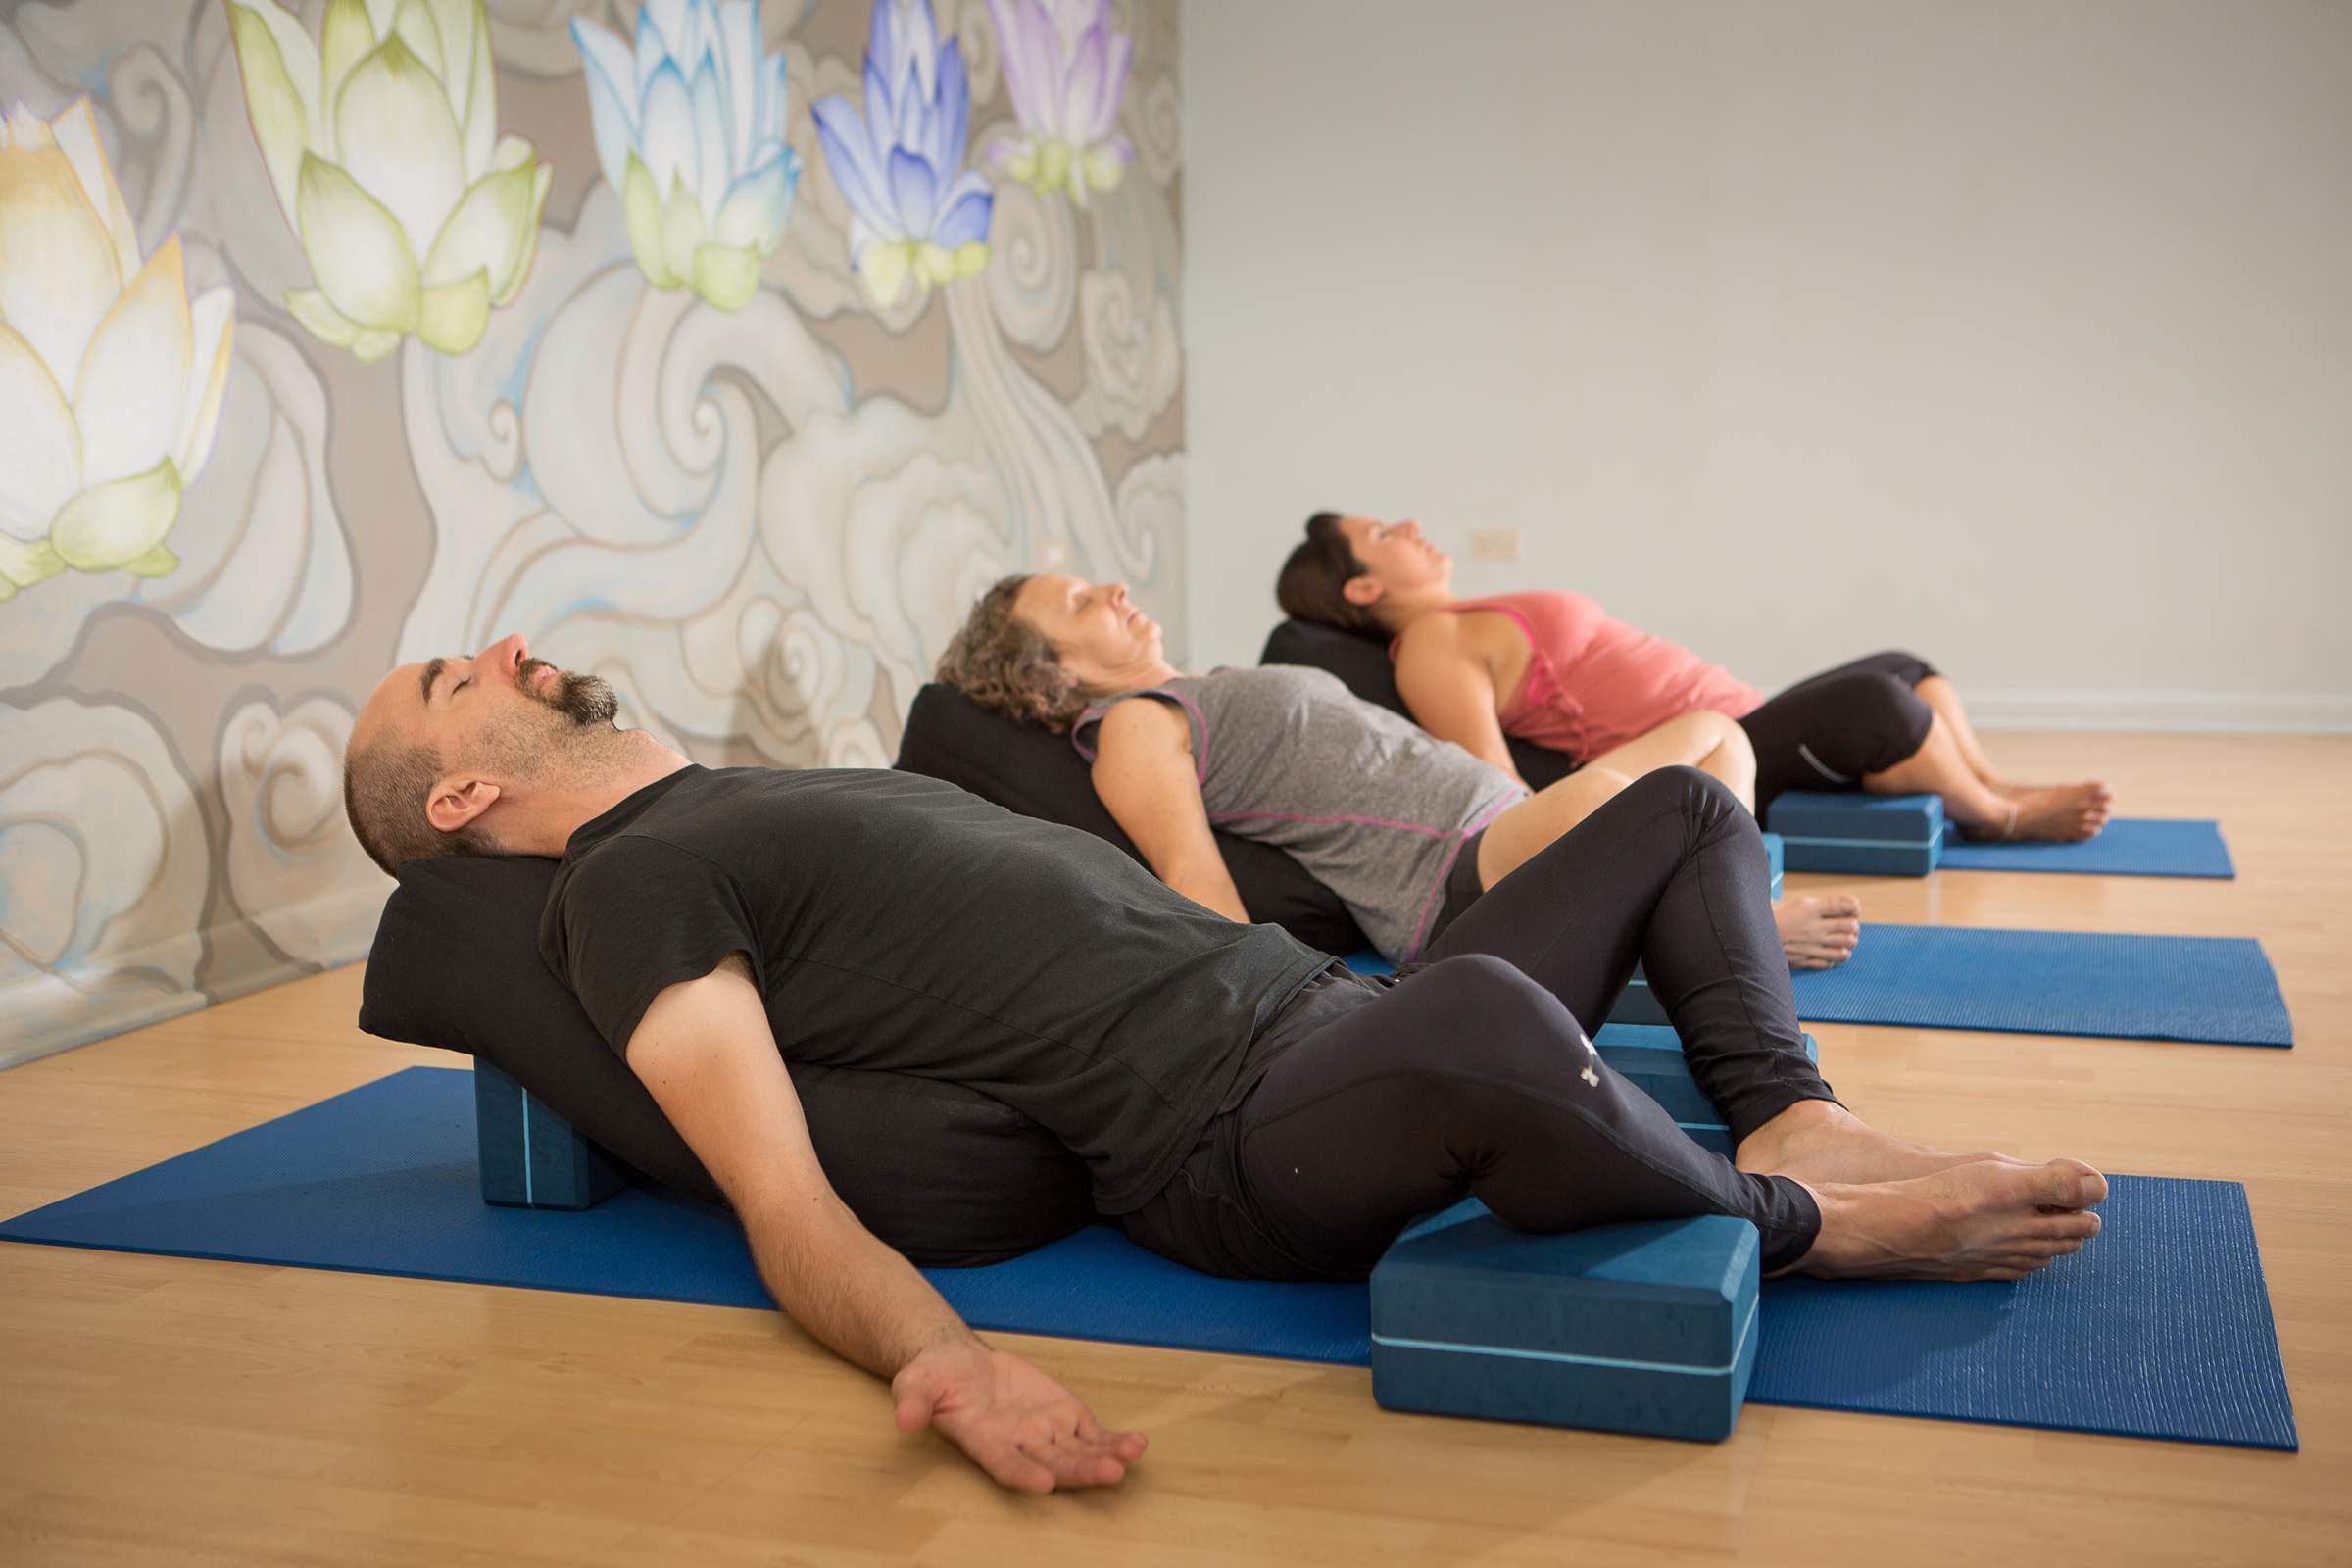 yoga shala elmhurst chicago metro area google street. Black Bedroom Furniture Sets. Home Design Ideas